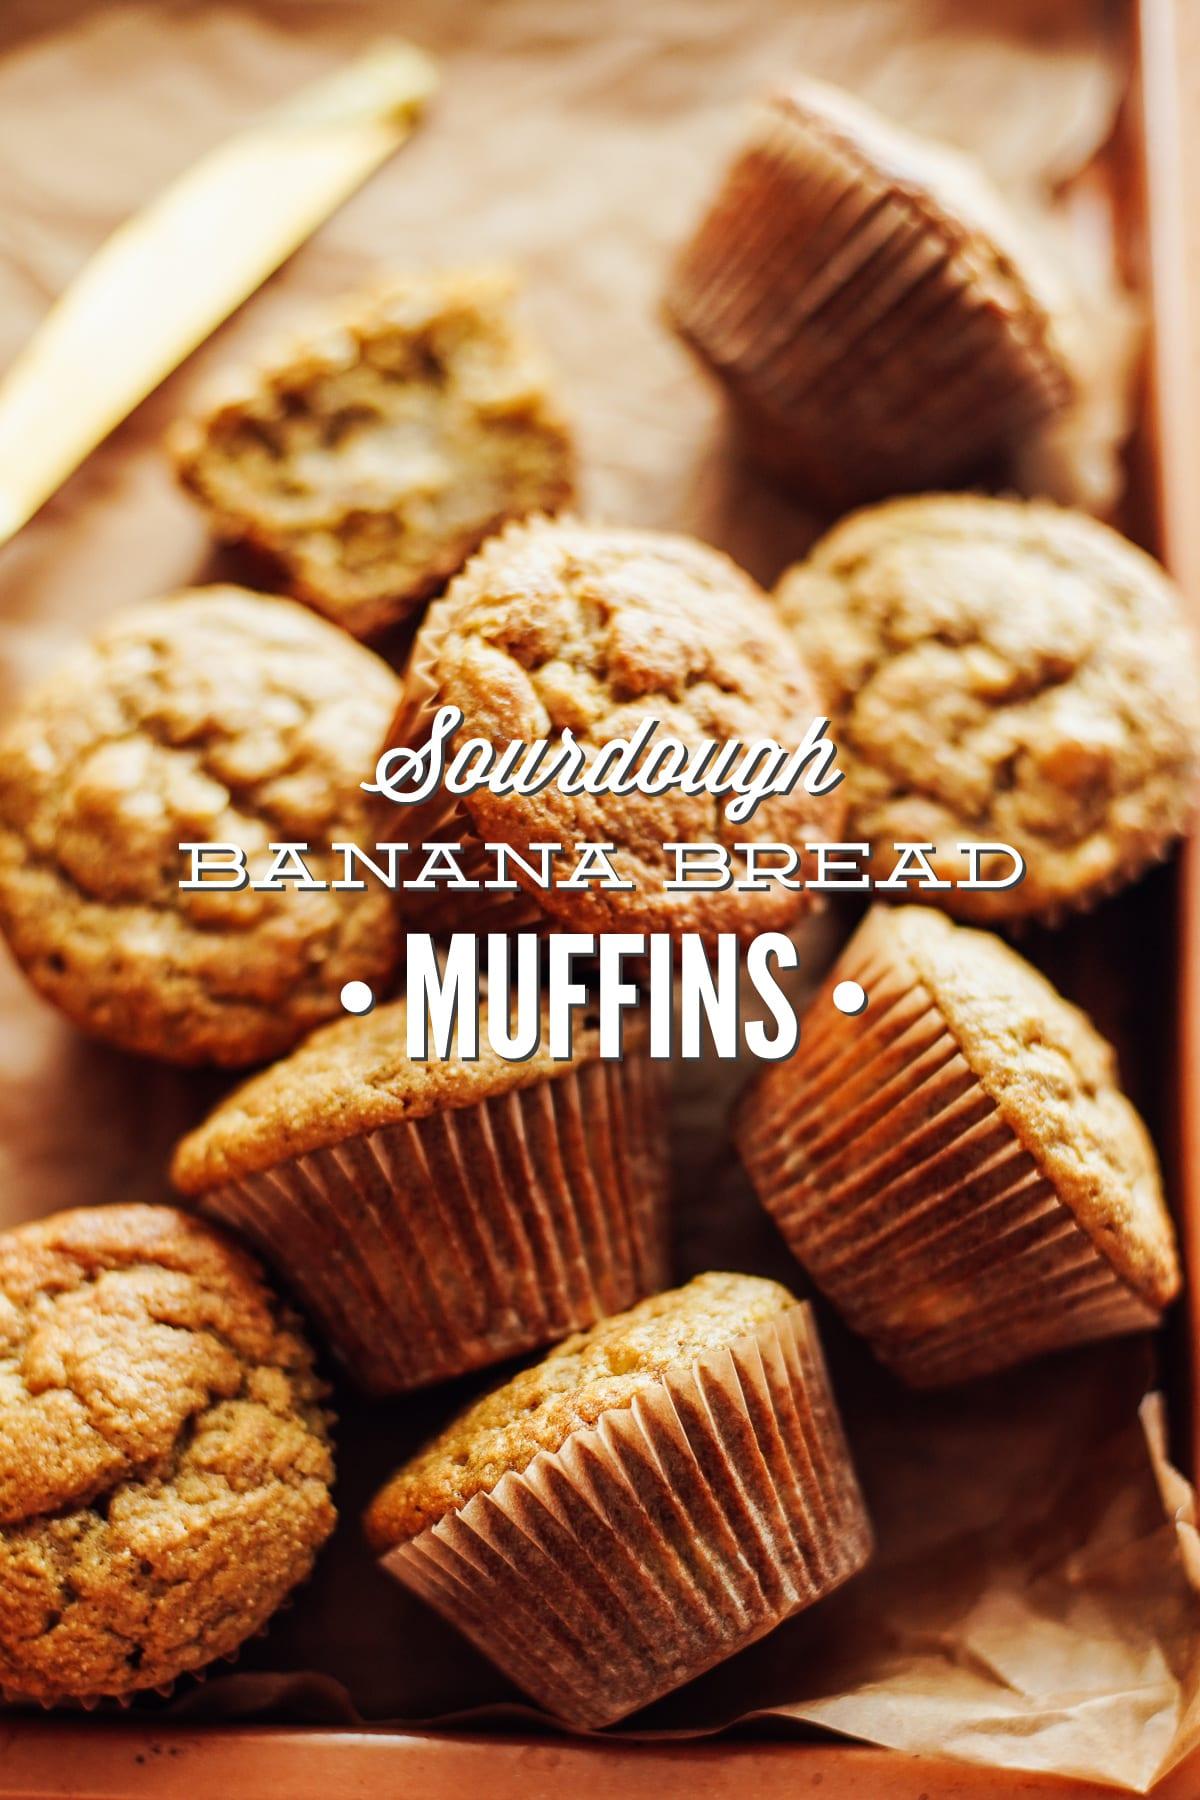 sourdough banana bread muffins